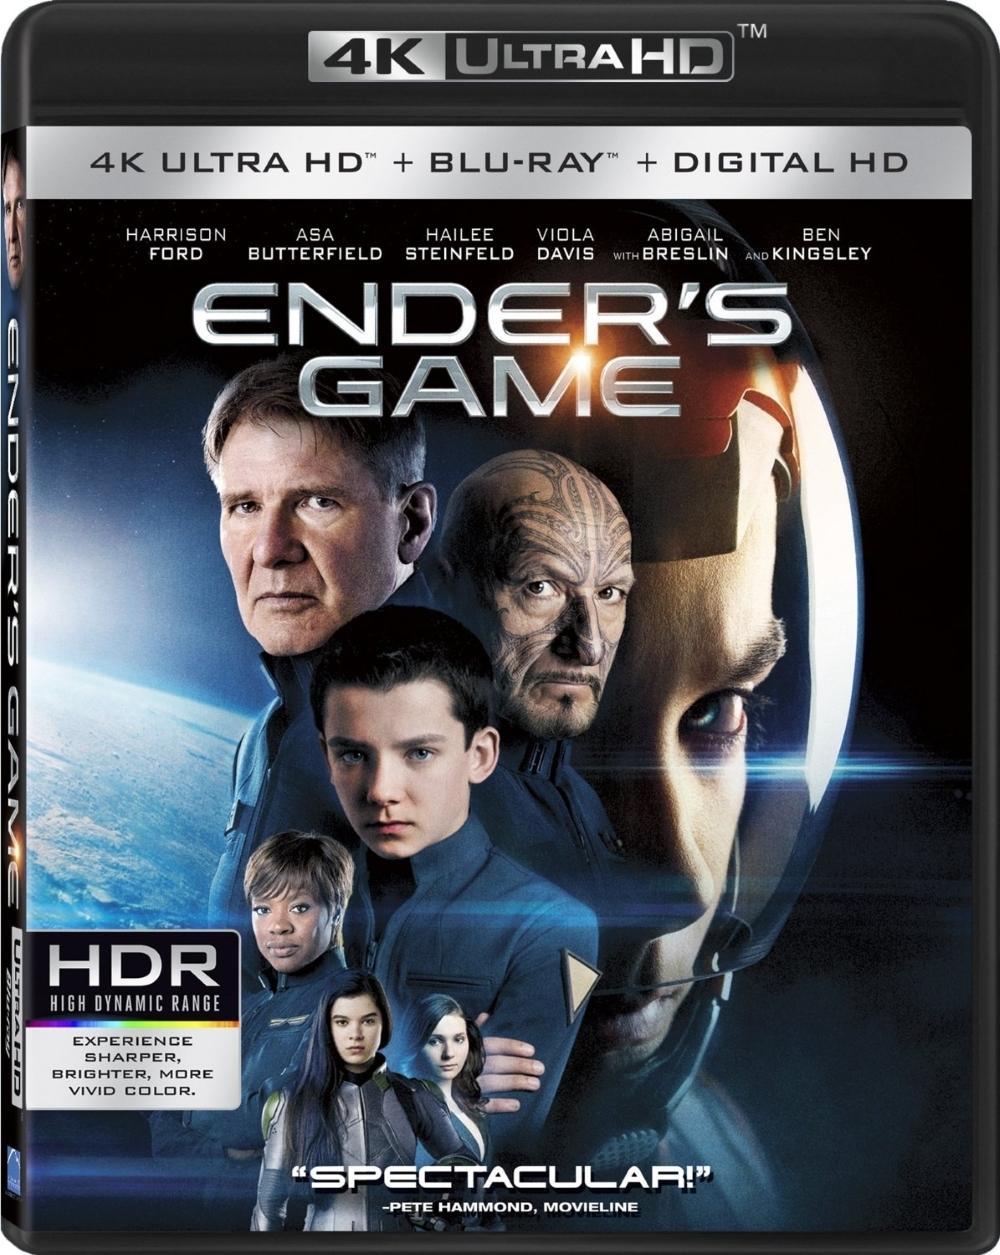 Ender s game the movie  4k ultra hd uhd   blu ray   digital hd ultraviolet uv